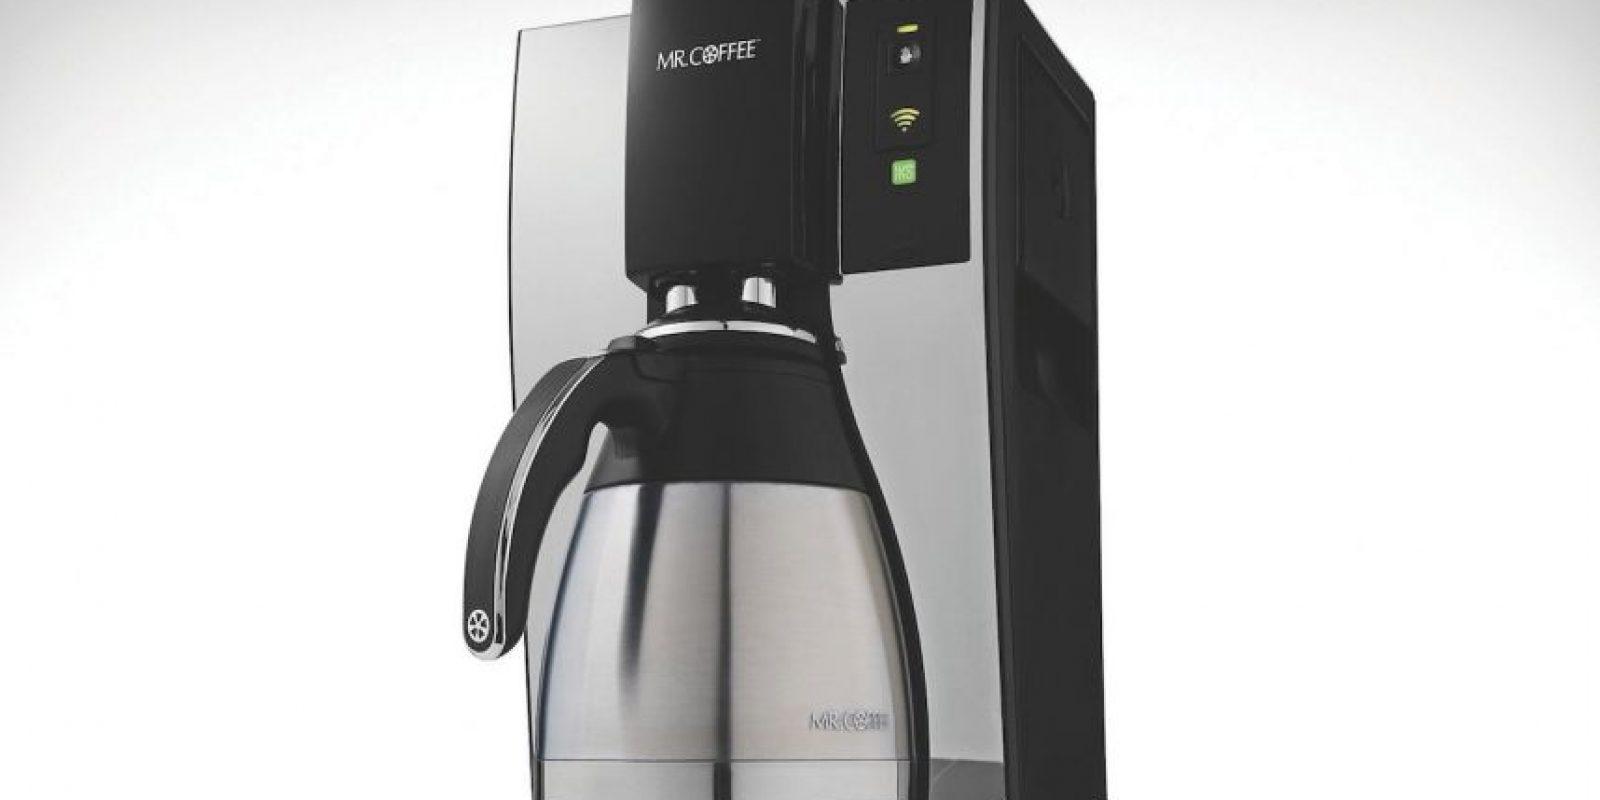 Mr. Coffee Smart Optimal Brew Coffee Maker Foto:Mrcoffee.com